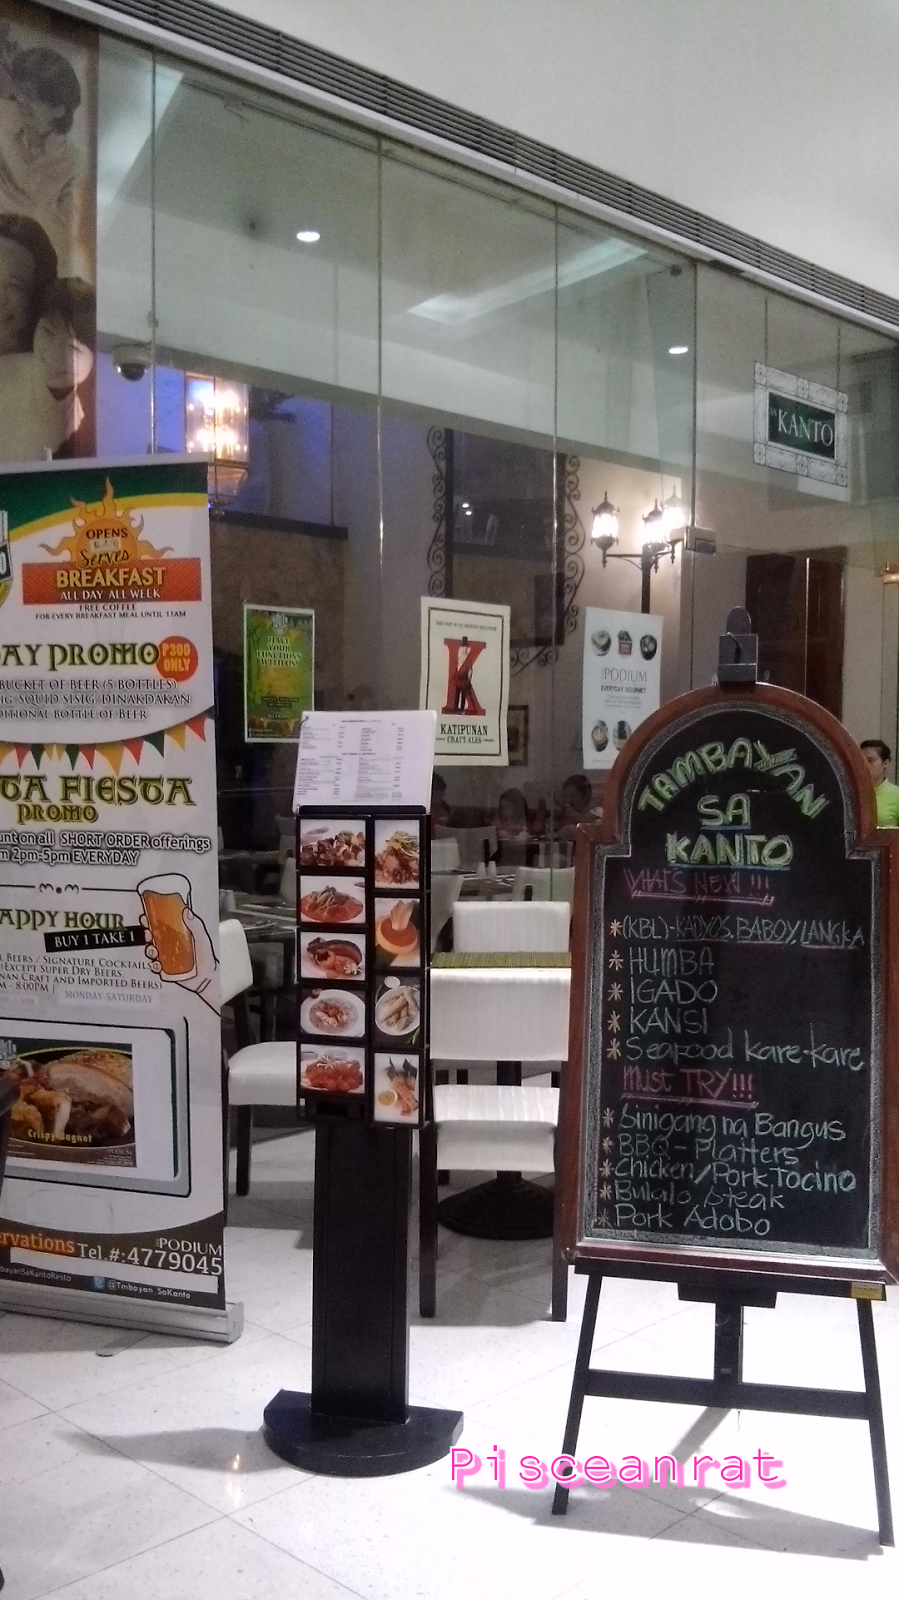 tambayan sa kanto authentic regional cuisine